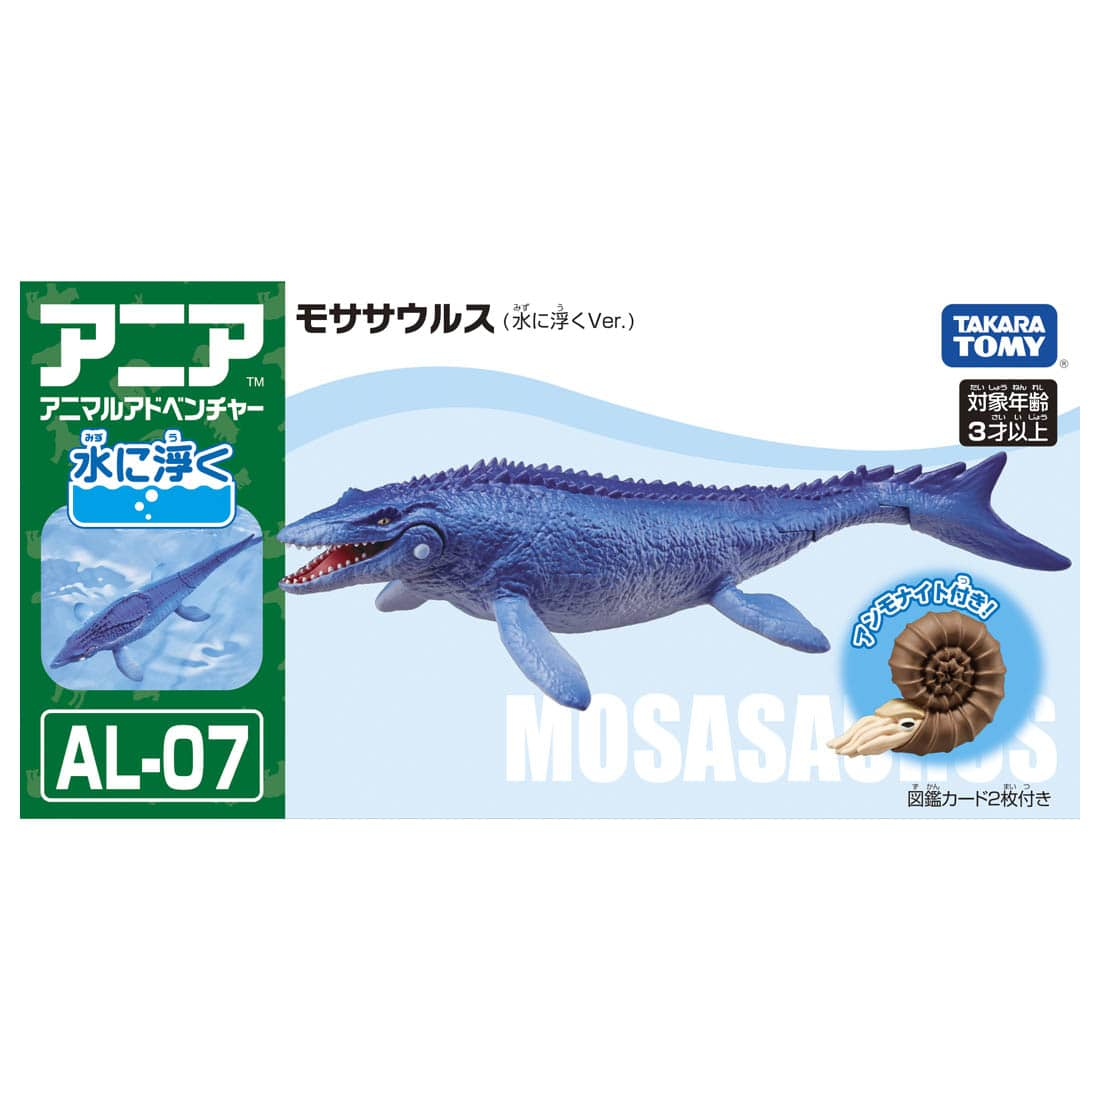 TOMY 動物模型 AL-07 滄龍 (飄浮版)